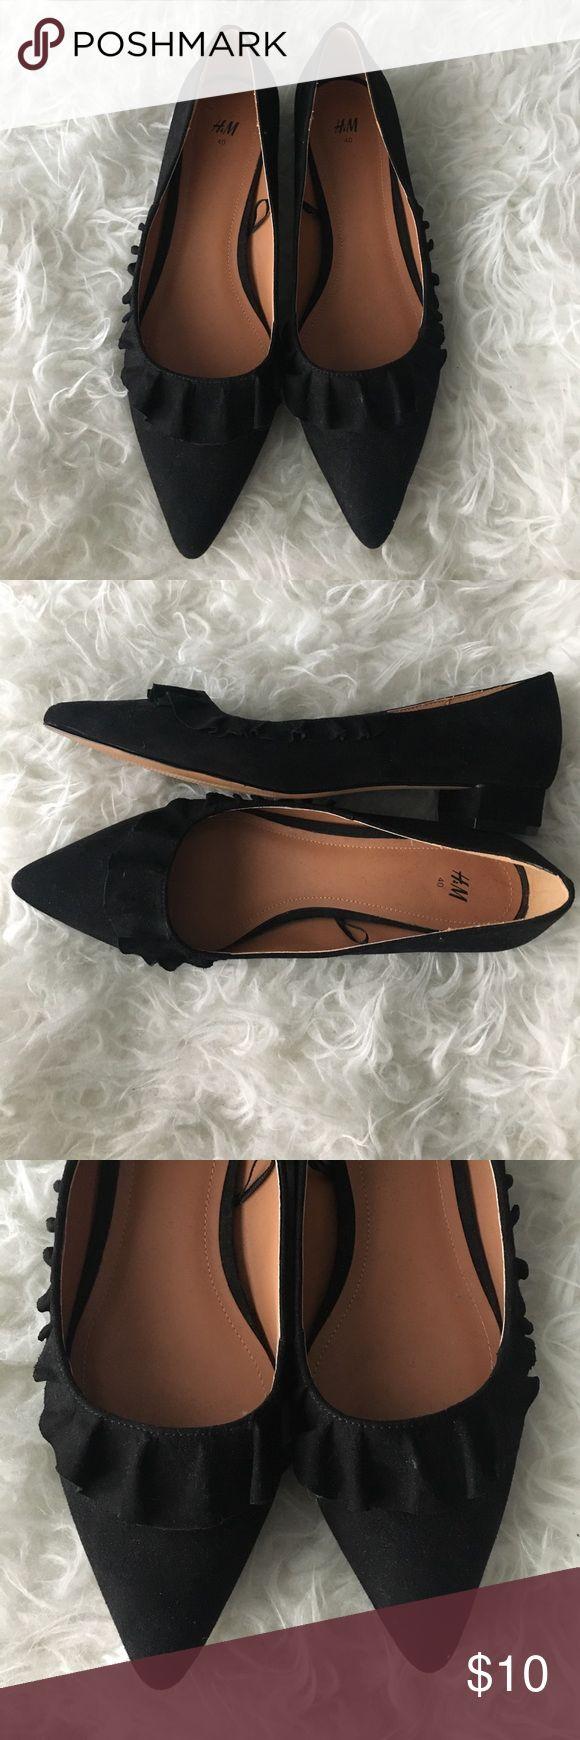 "H&M heels only worn a few times! 1"" heel. H&M Shoes Heels"